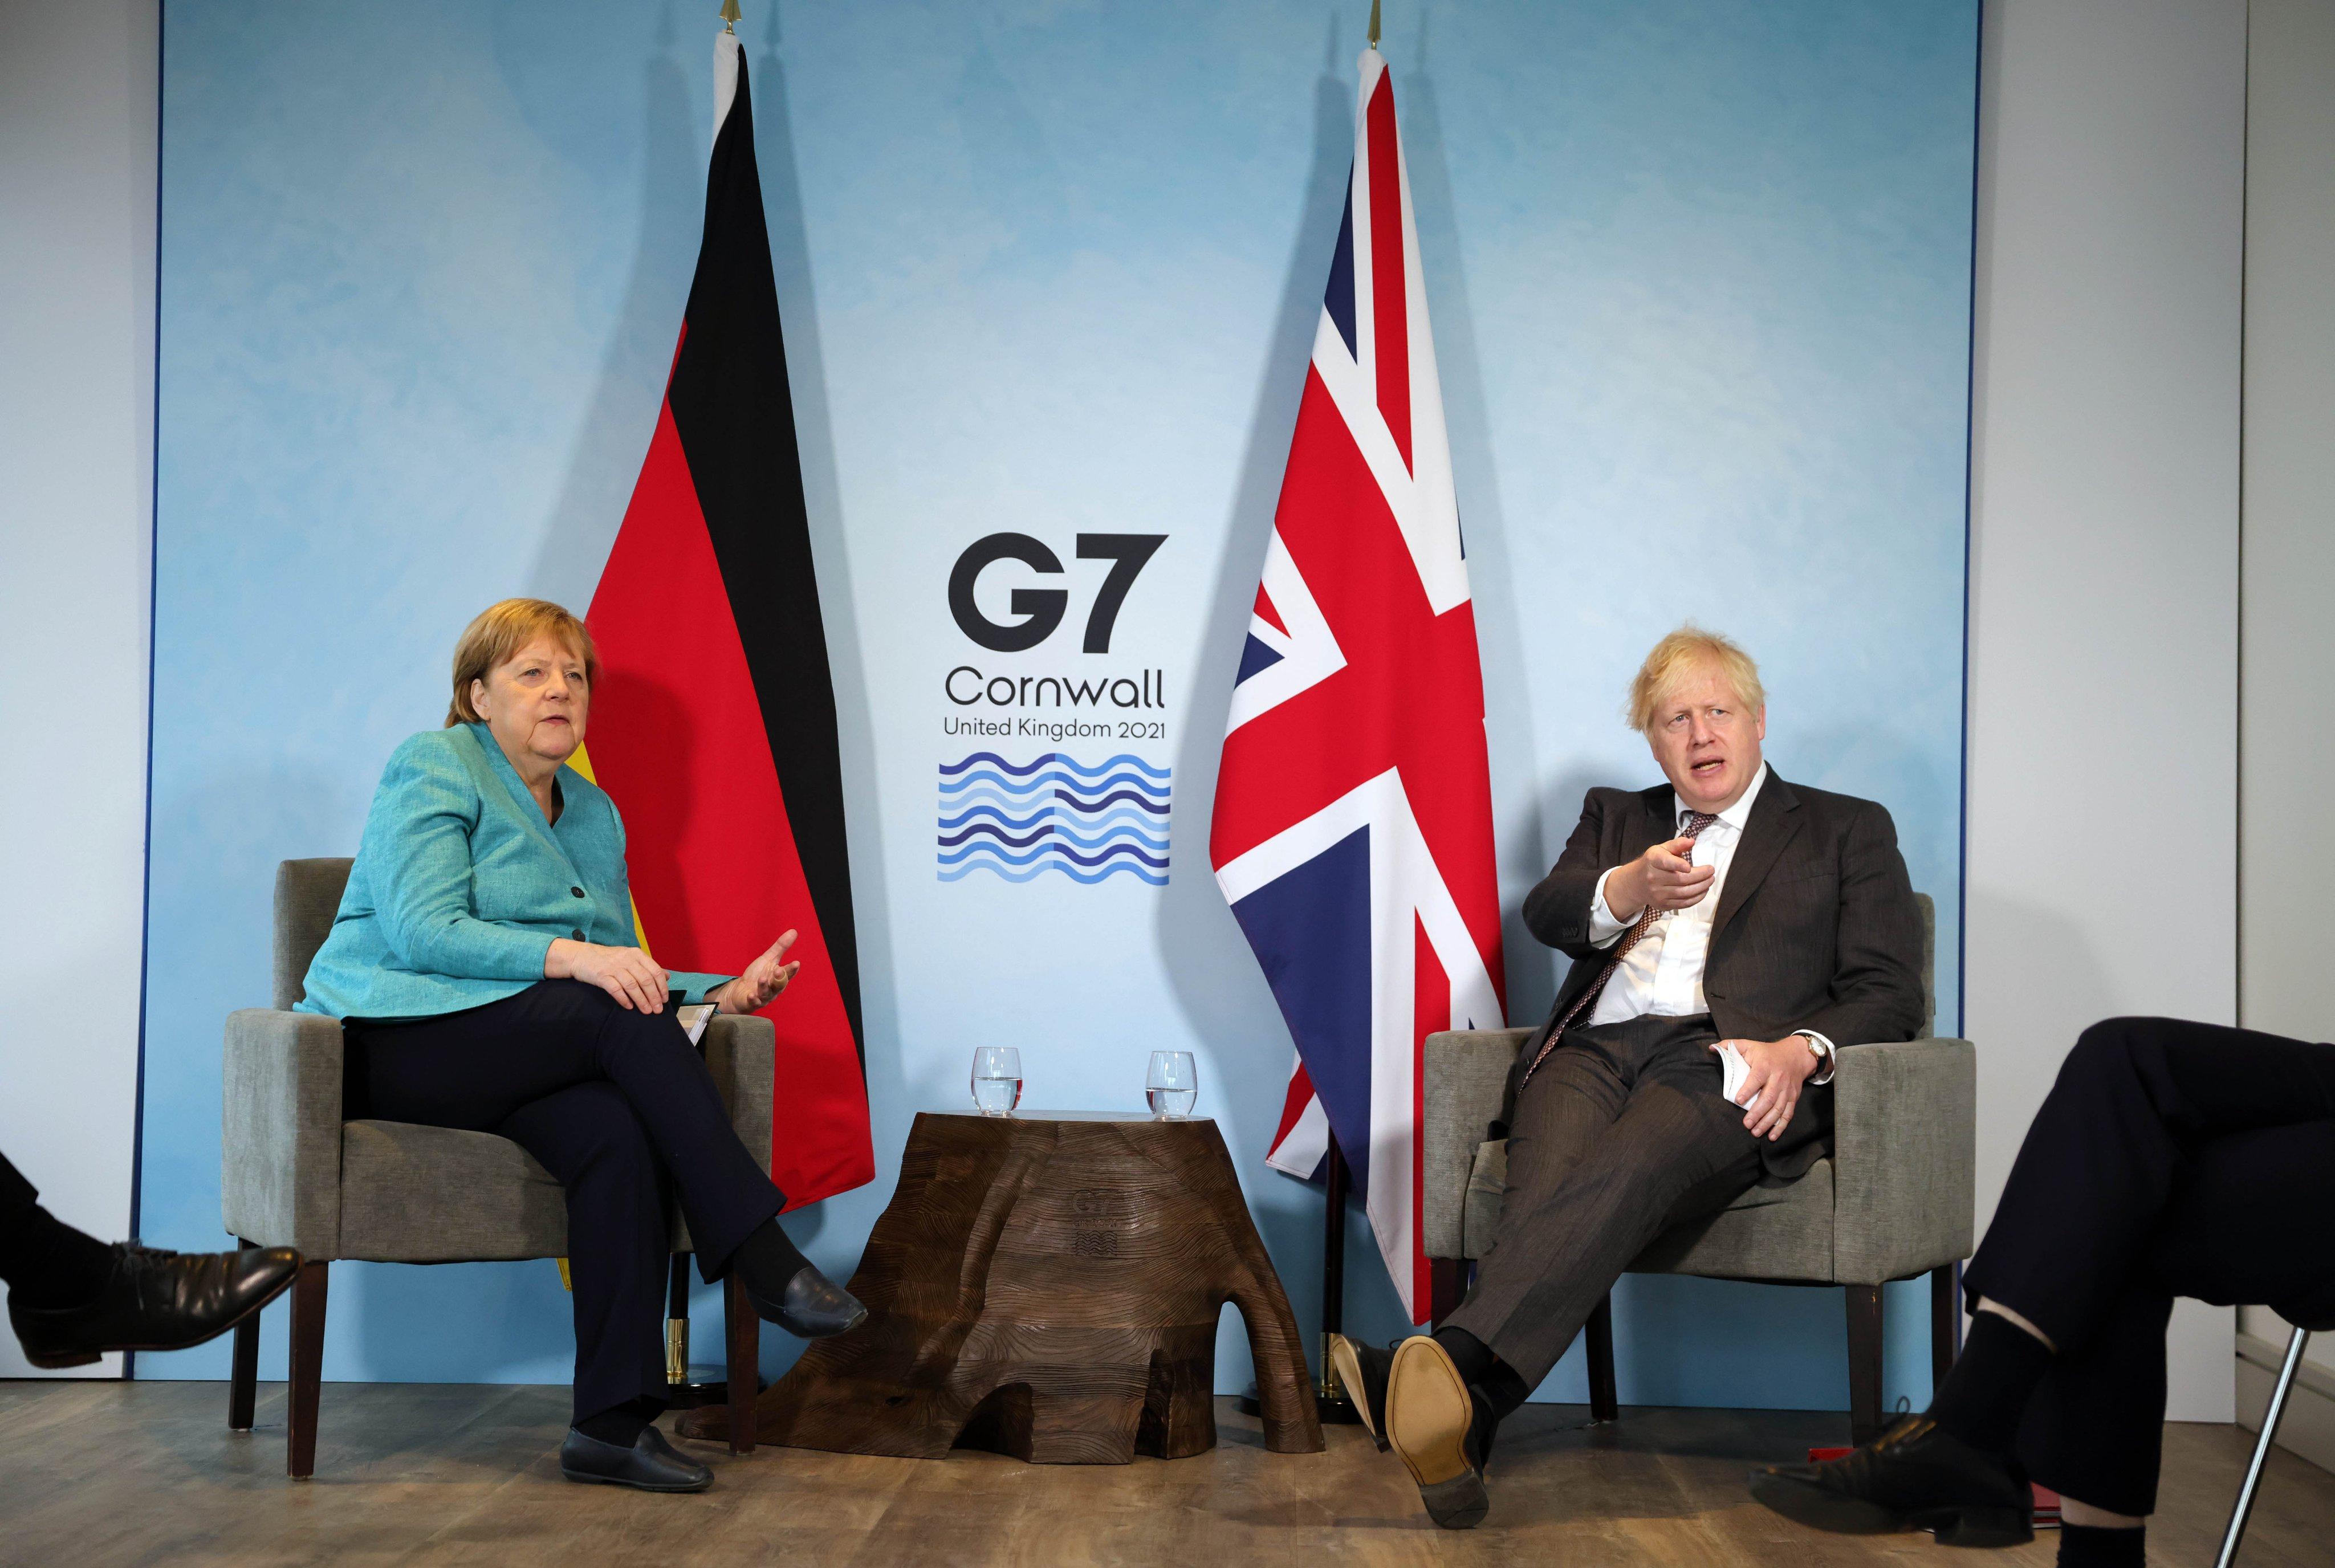 जर्मनी की चांसलर एंजेला मर्केल से चर्चा करते ब्रिटेन के प्रधानमंत्री बोरिस जॉनसन।